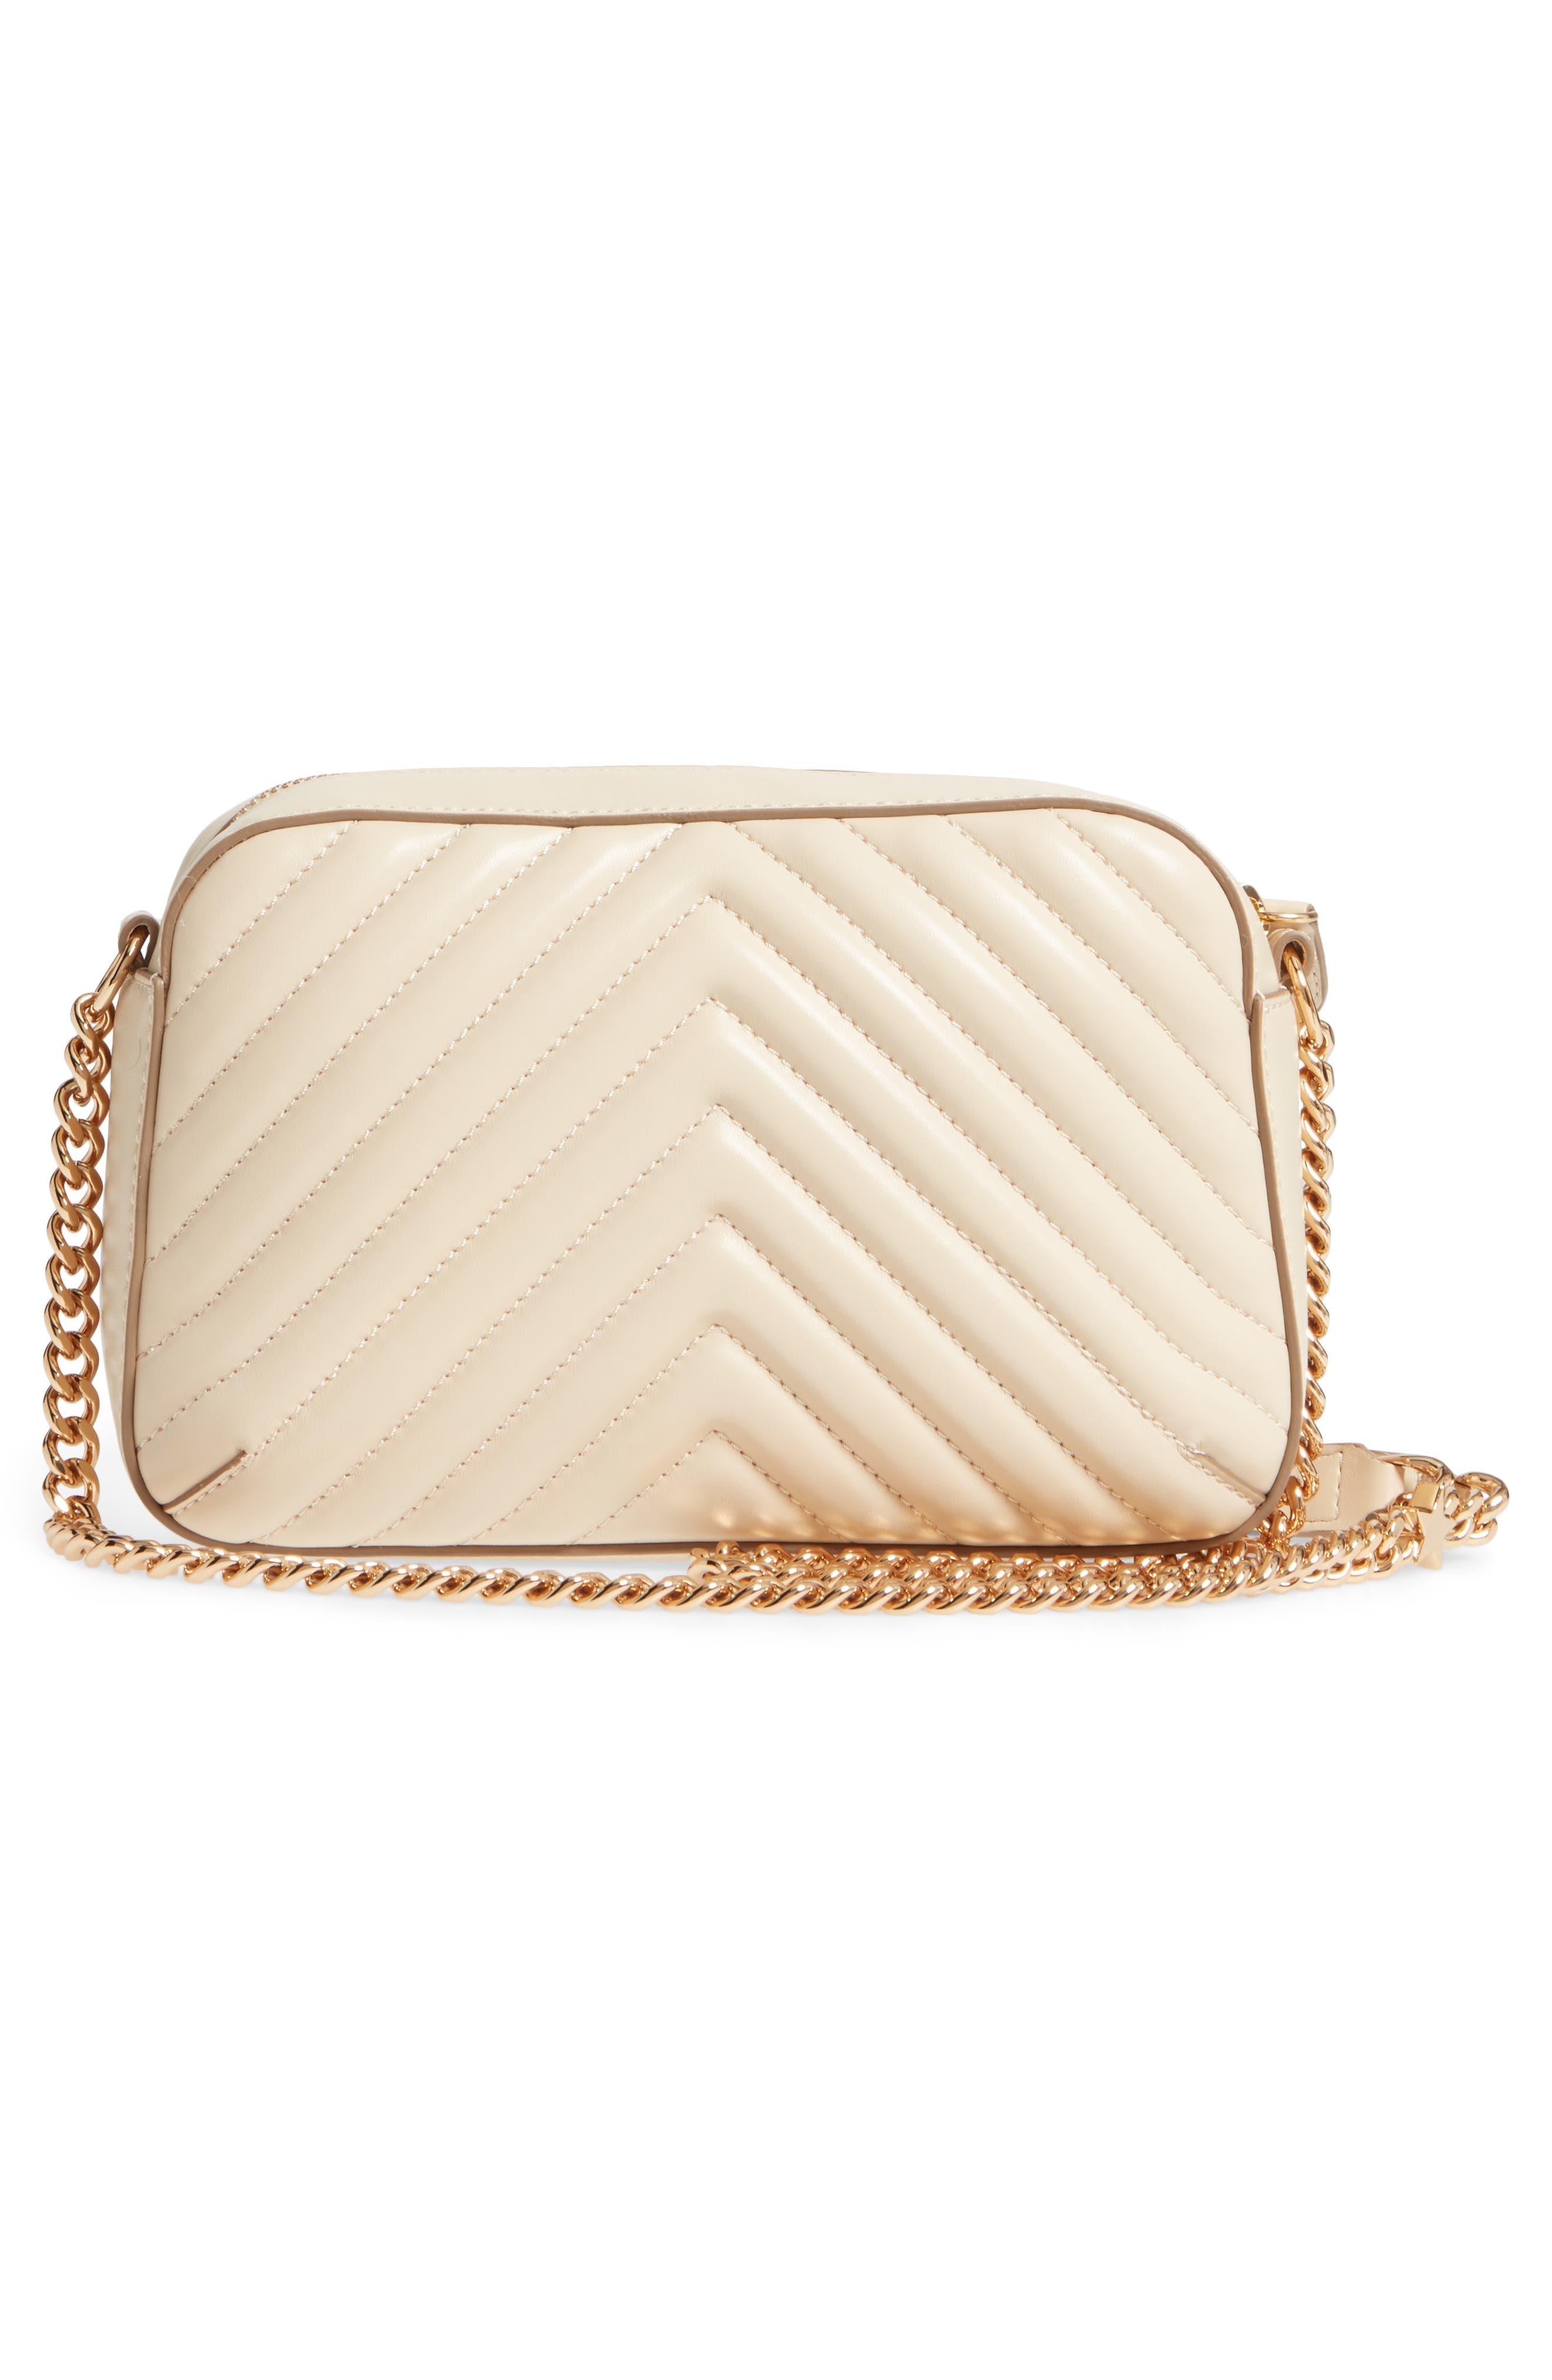 Alter Nappa Faux Leather Shoulder Bag,                             Alternate thumbnail 3, color,                             Cream